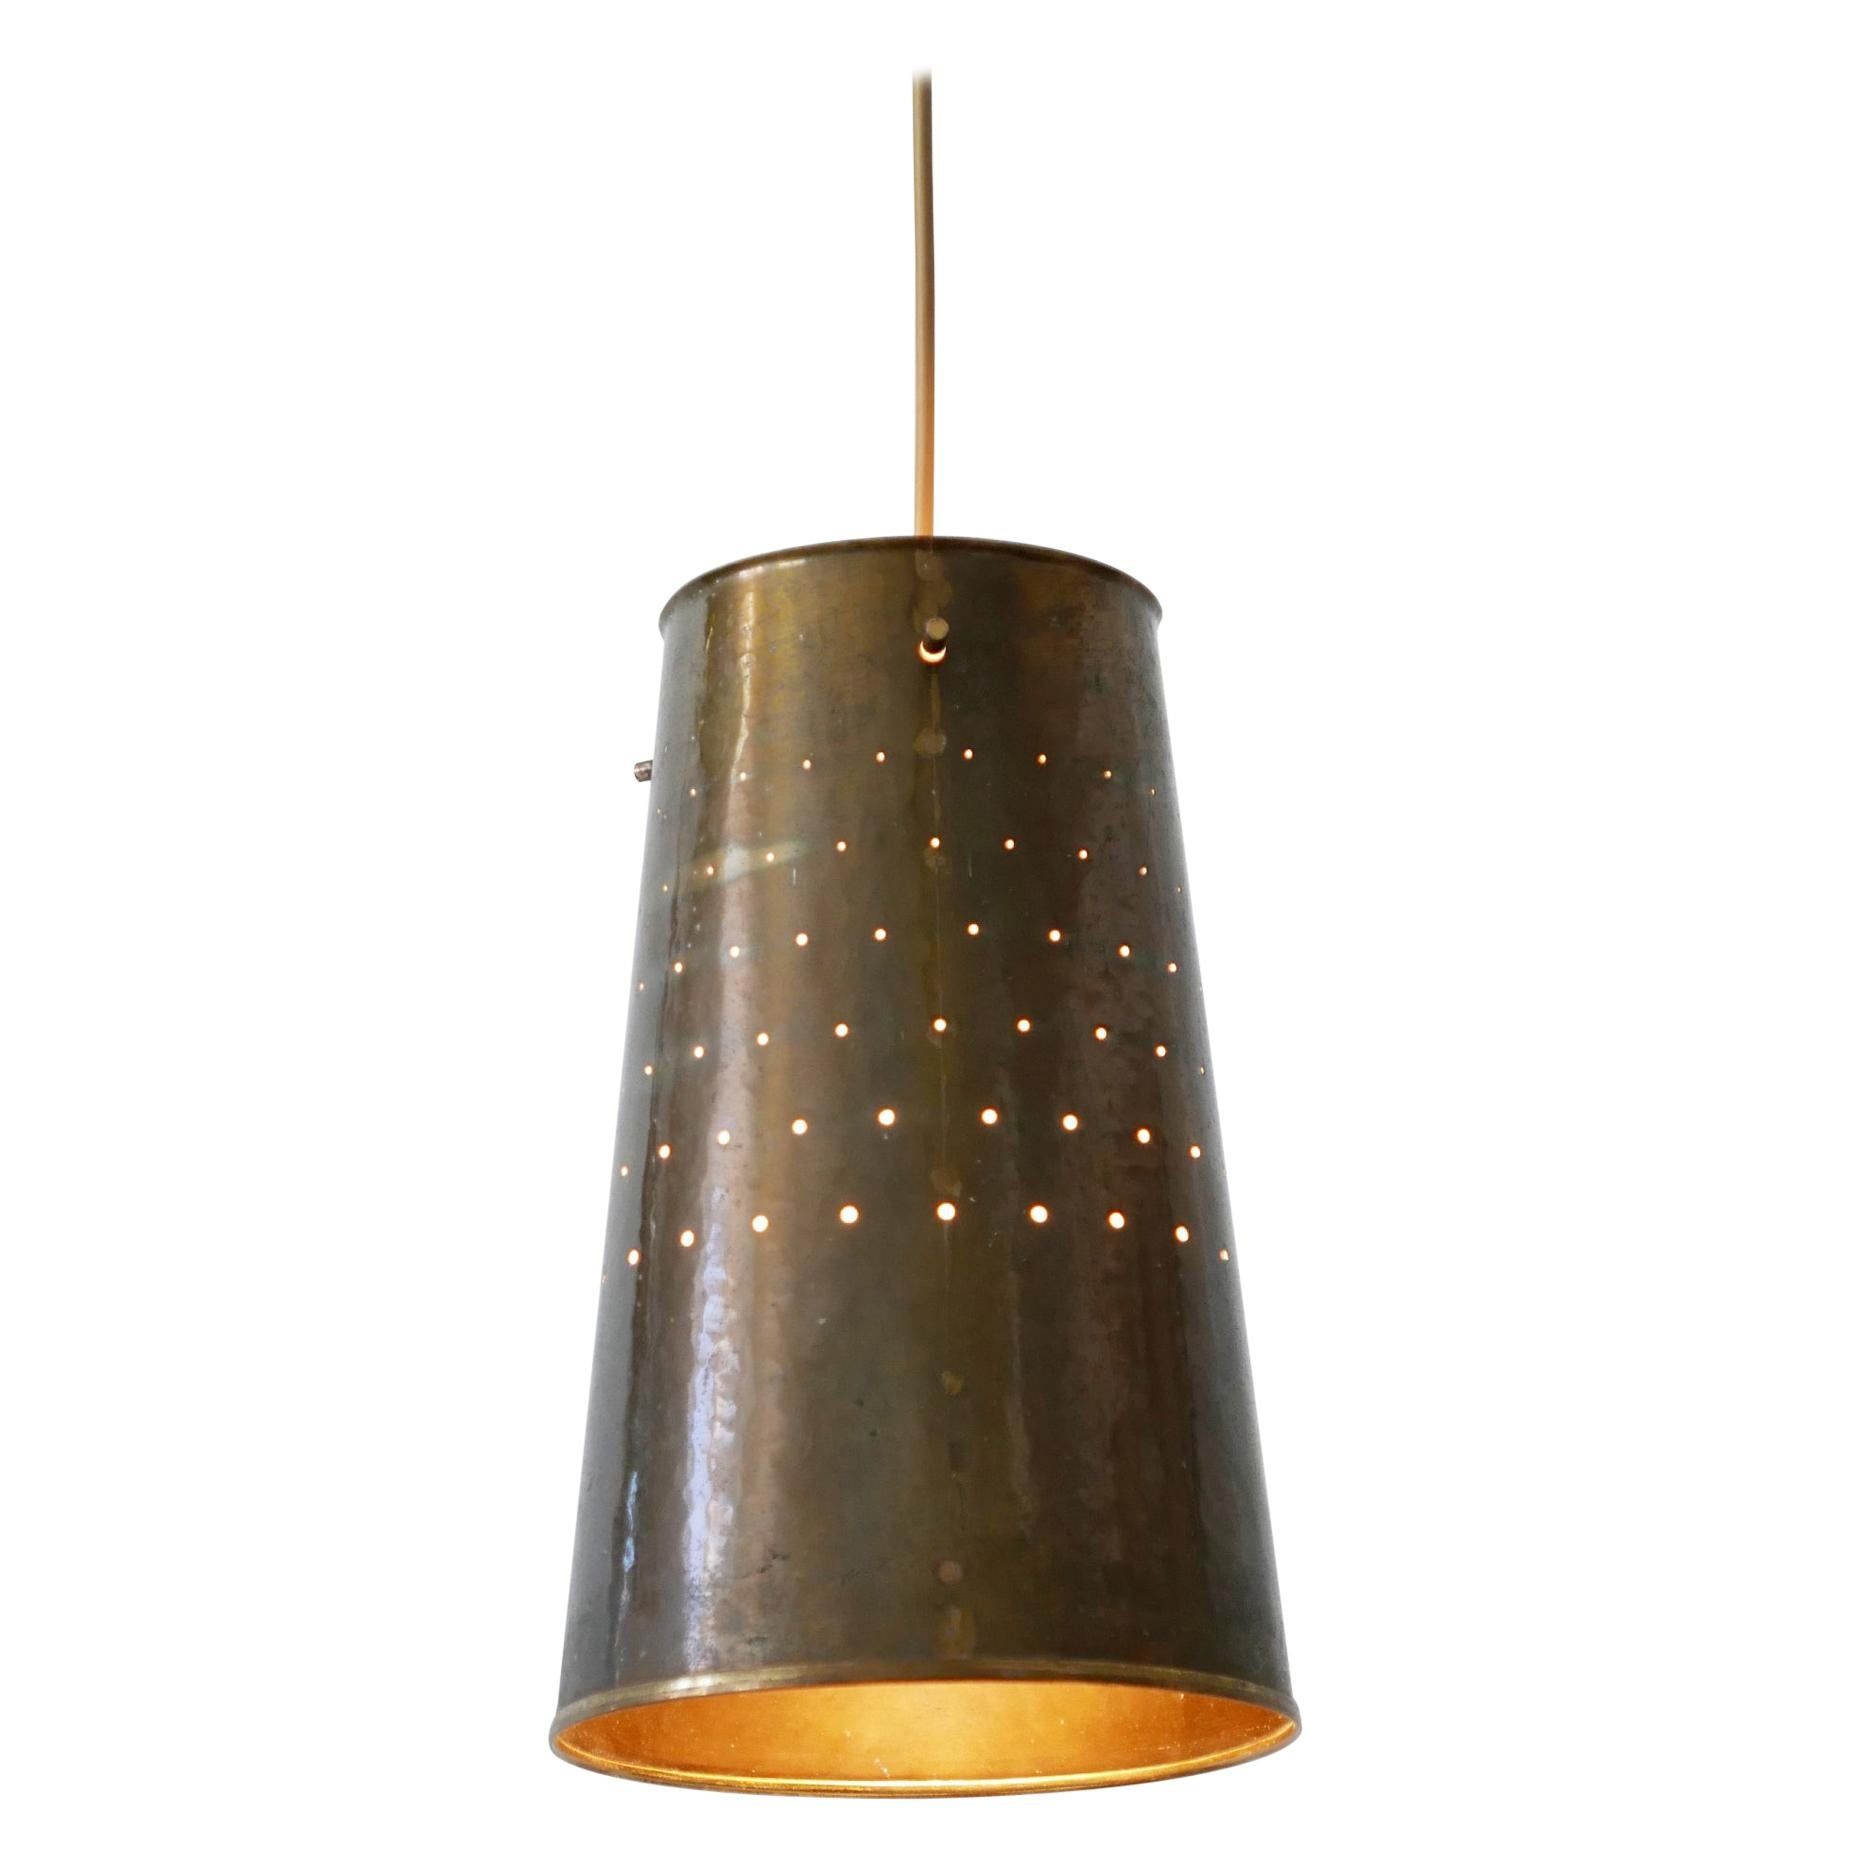 Rare and Elegant Mid-Century Modern Brass Pendant Lamp, 1950s, Germany